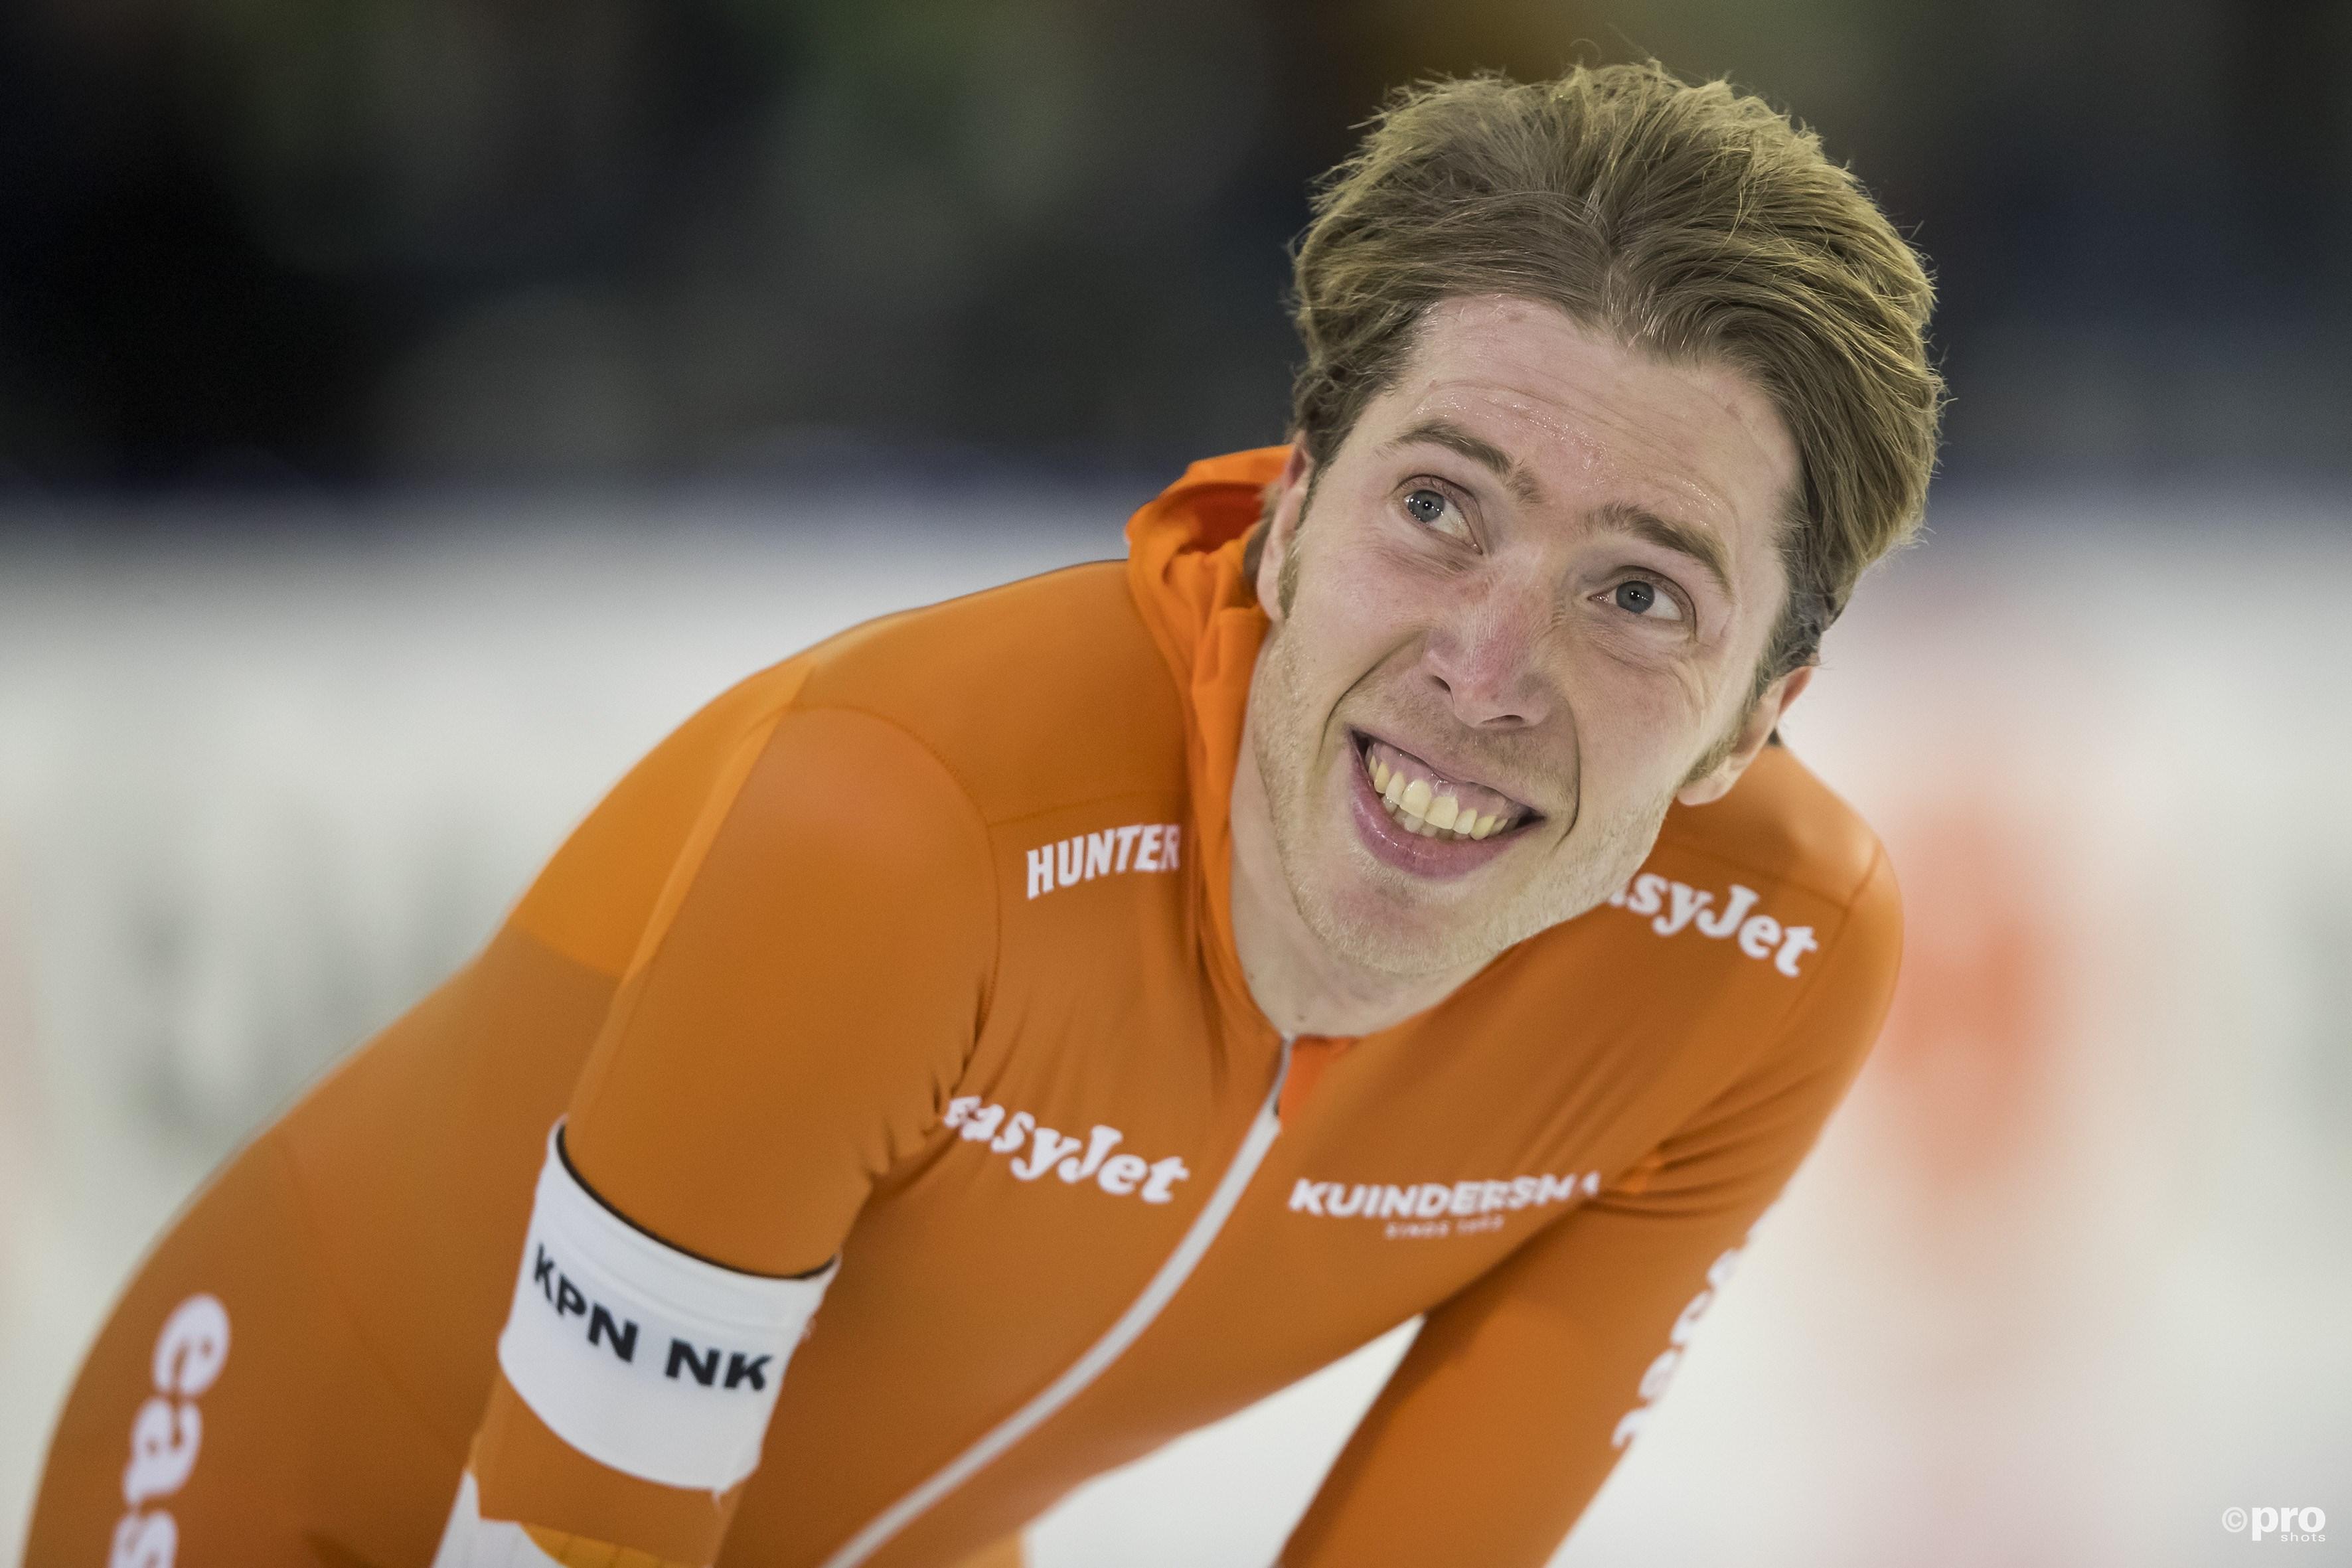 Bergsma klopt Roest na prachtige tien kilometer (Pro Shots/Erik Pasman)